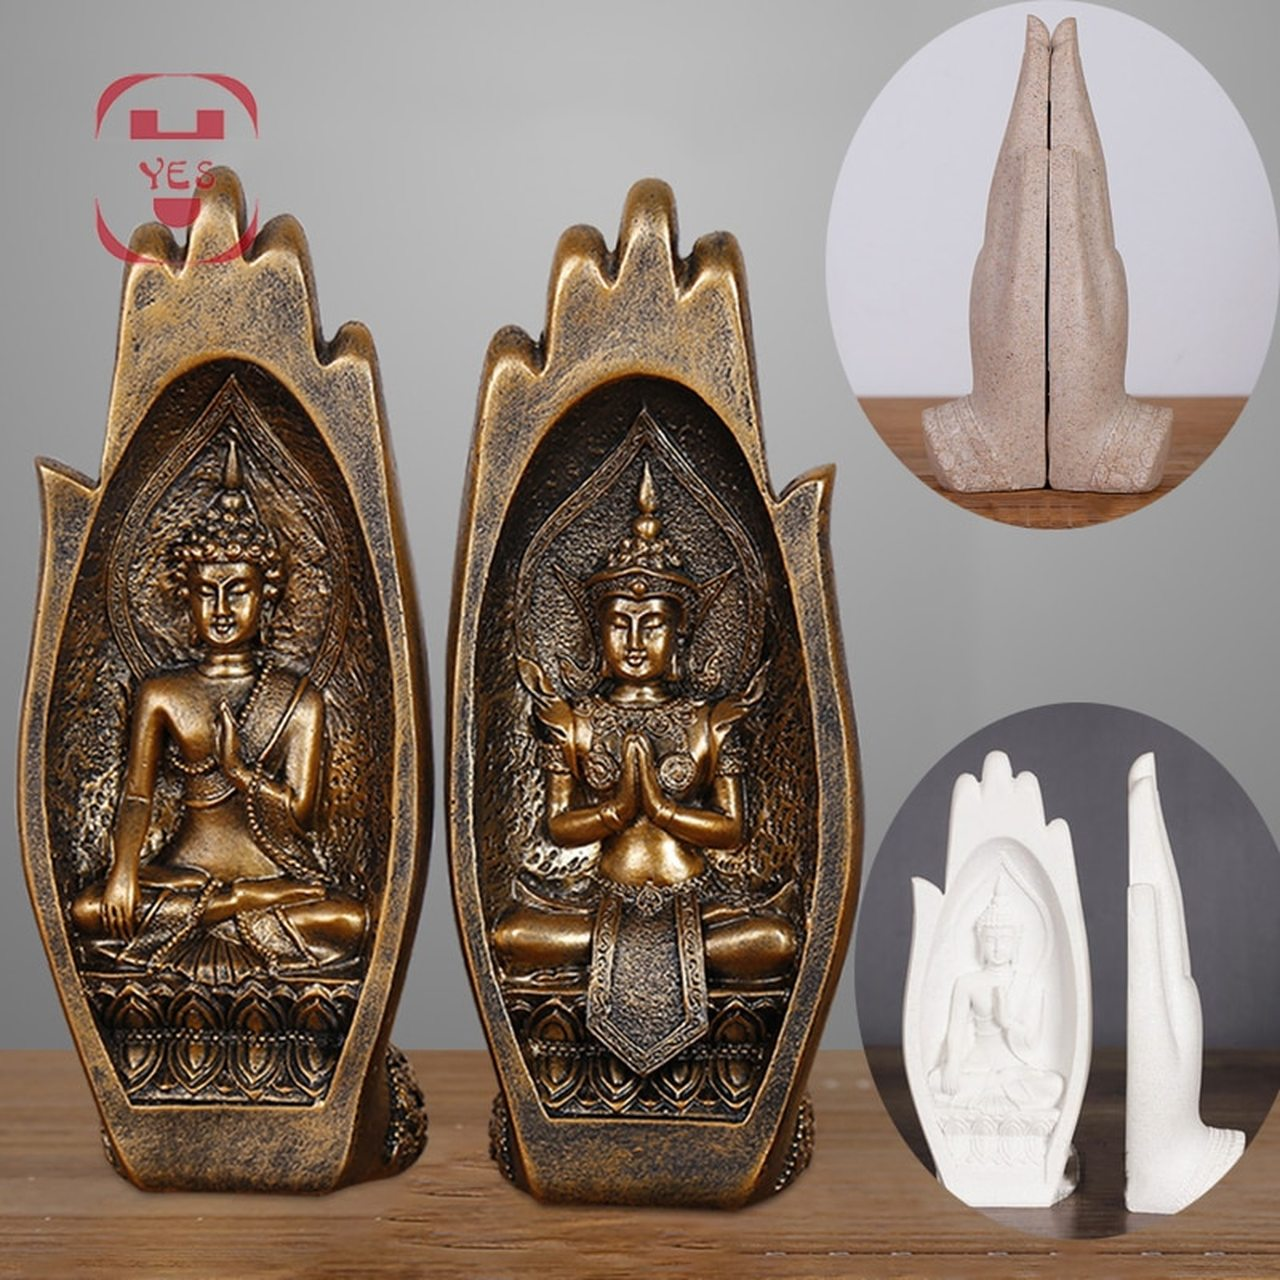 Two Pieces Resin Buddha Figurine